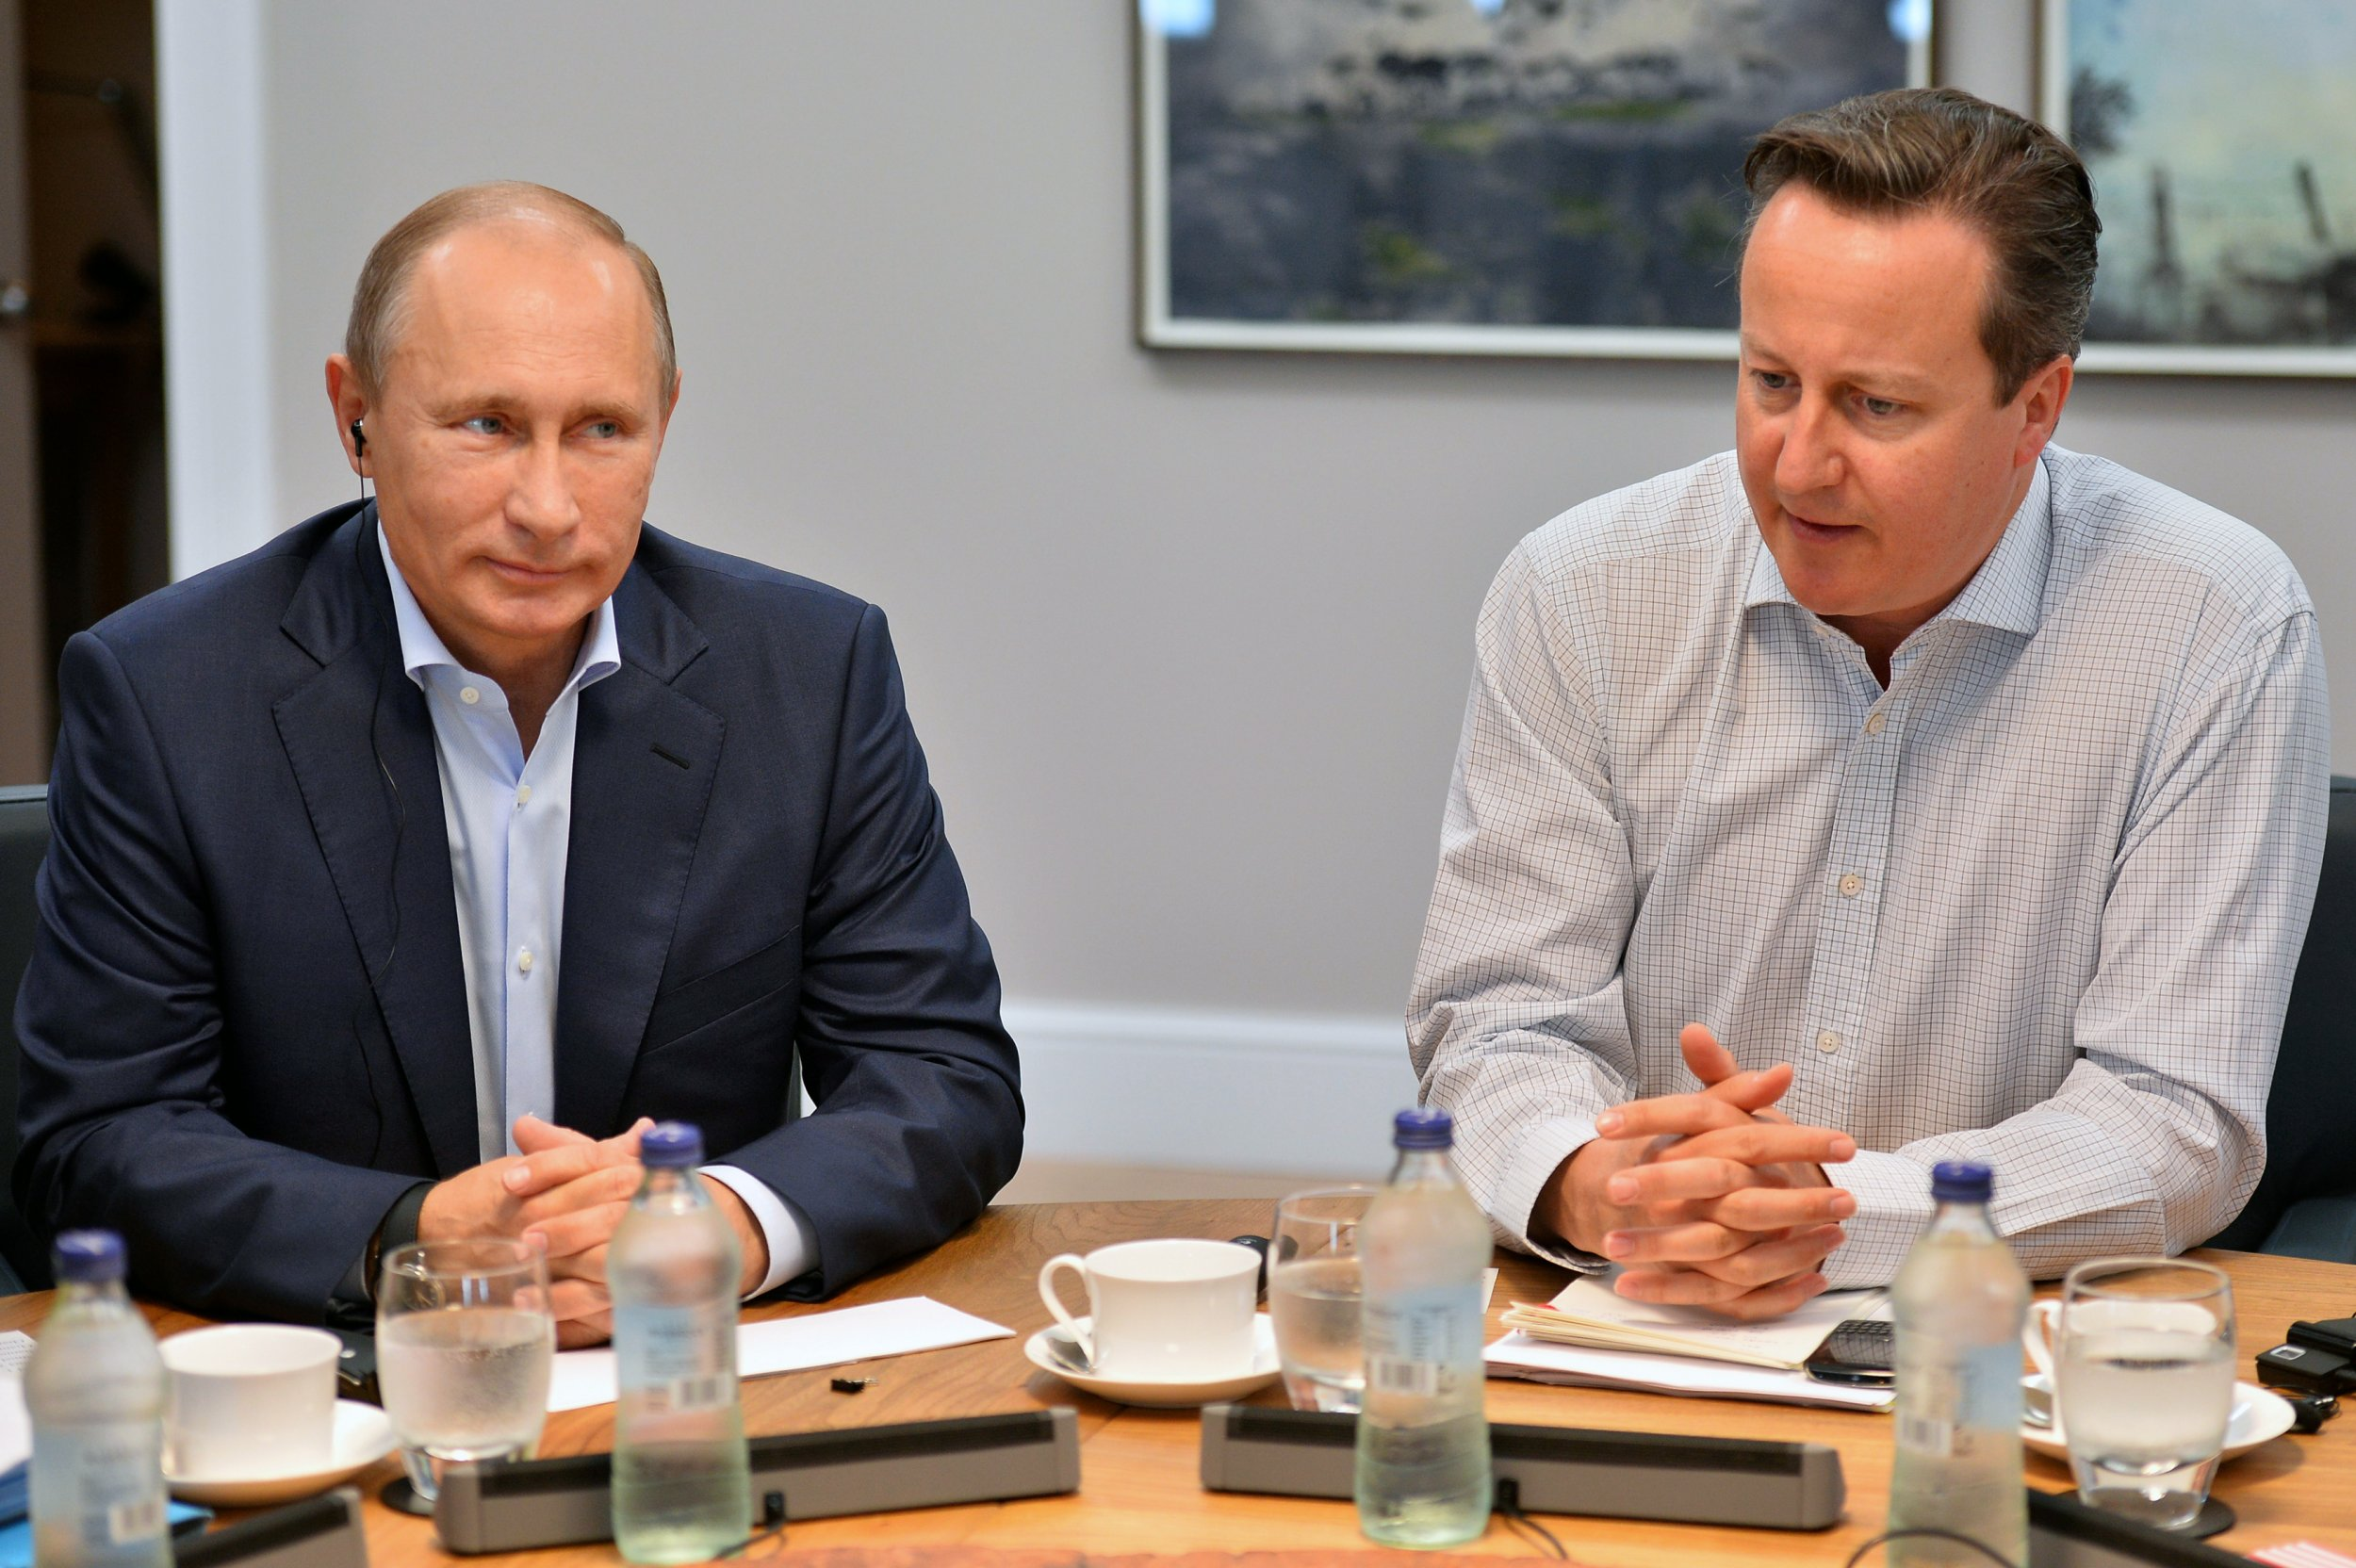 Putin and Cameron